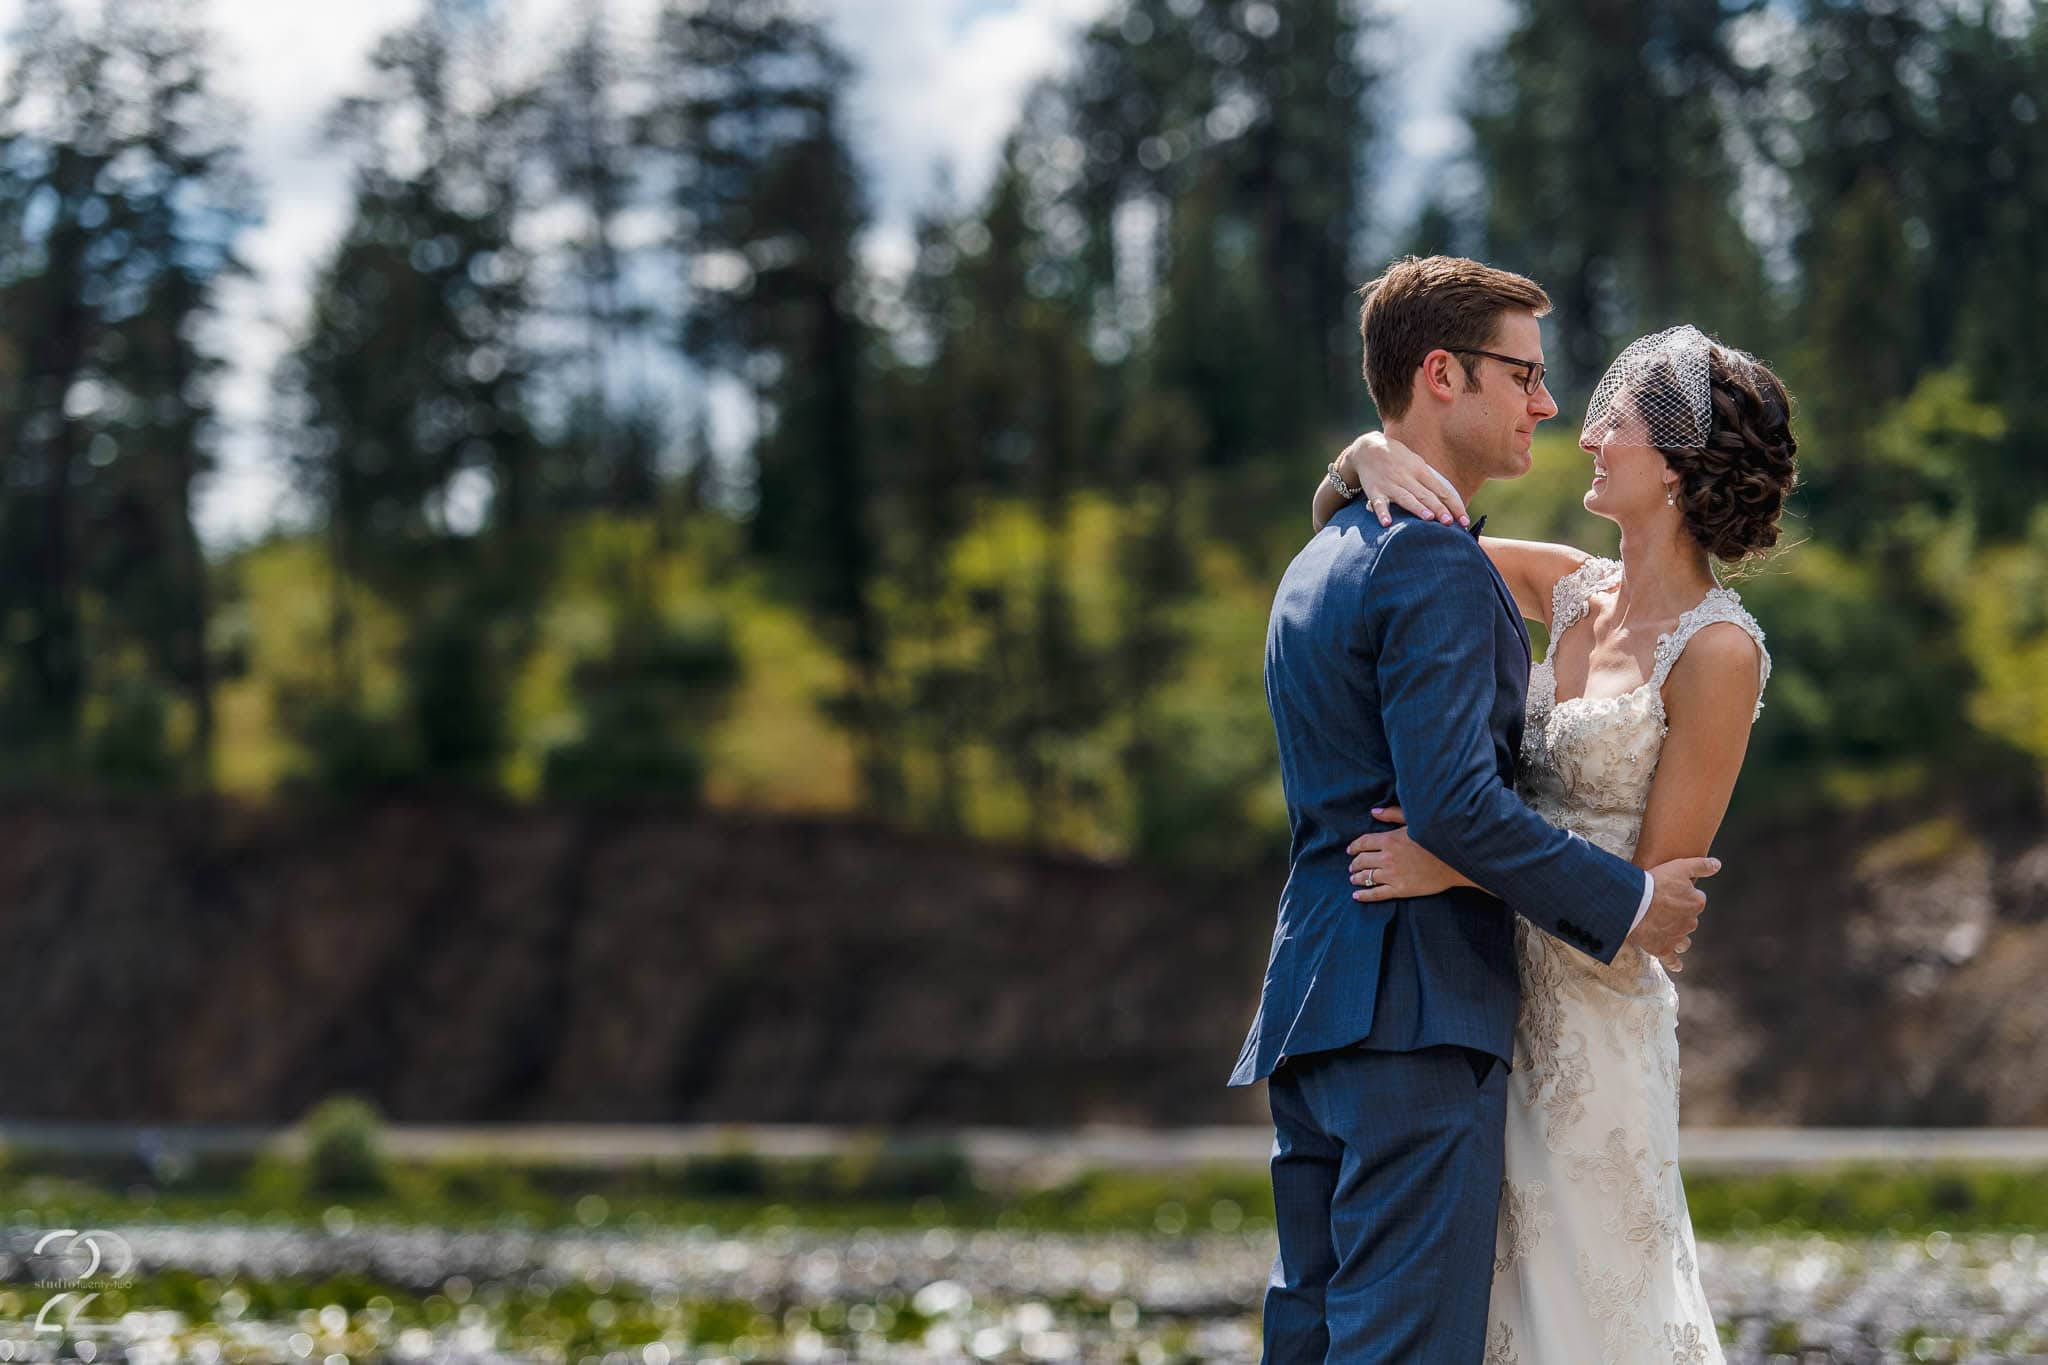 Destination Weddings in Coeur d'Alene